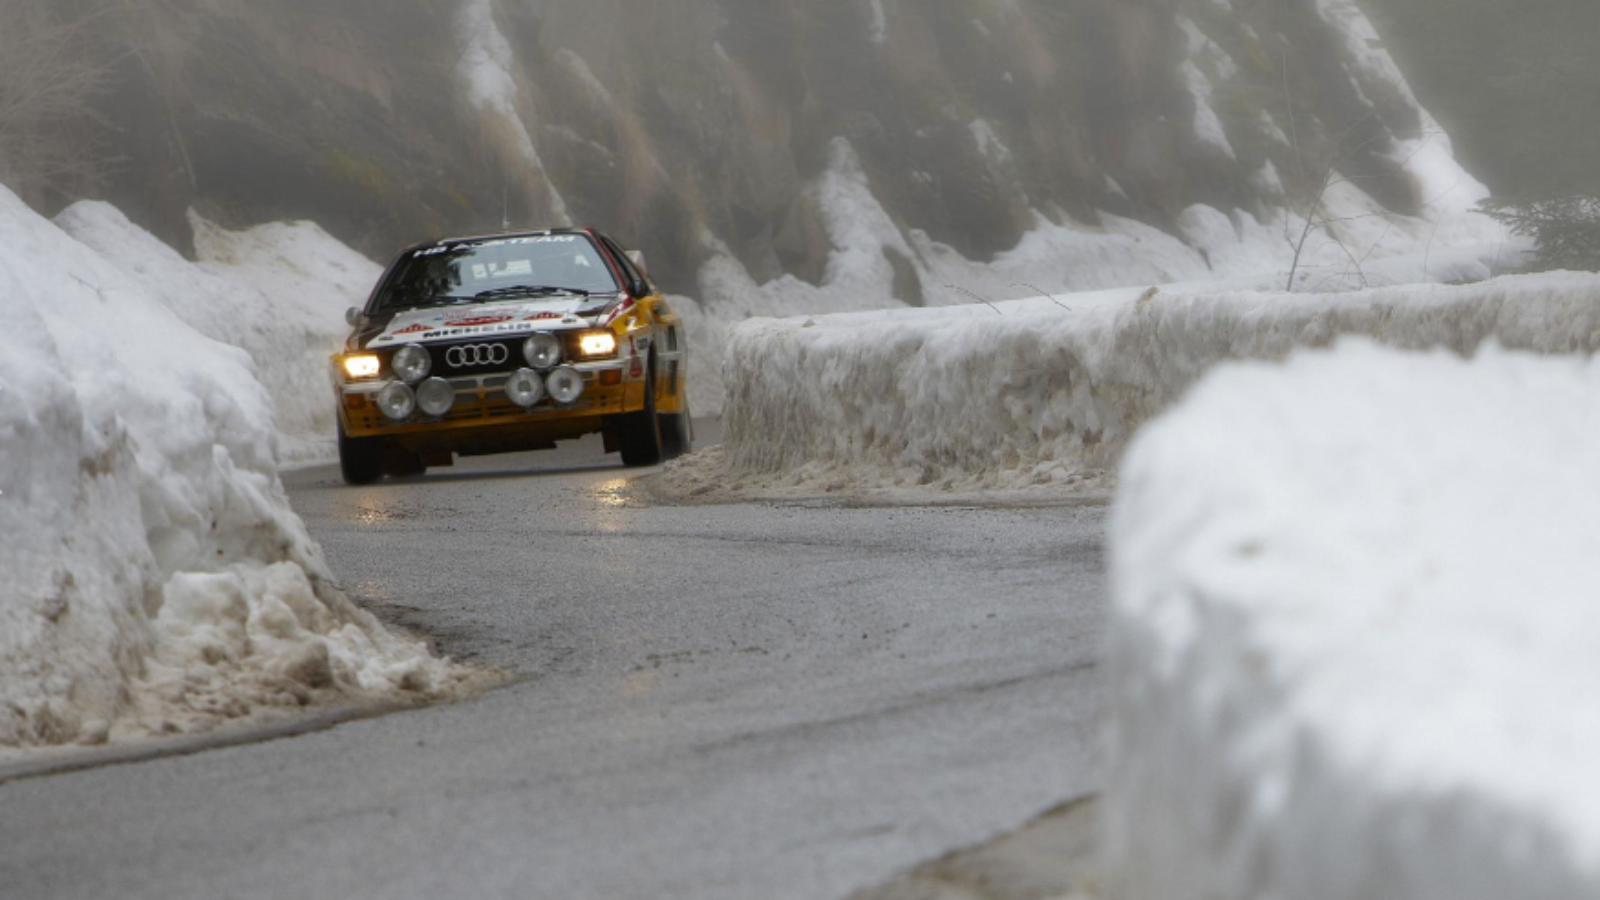 Top Gear Took a Trip with Walter Röhrl in a Ur-quattro